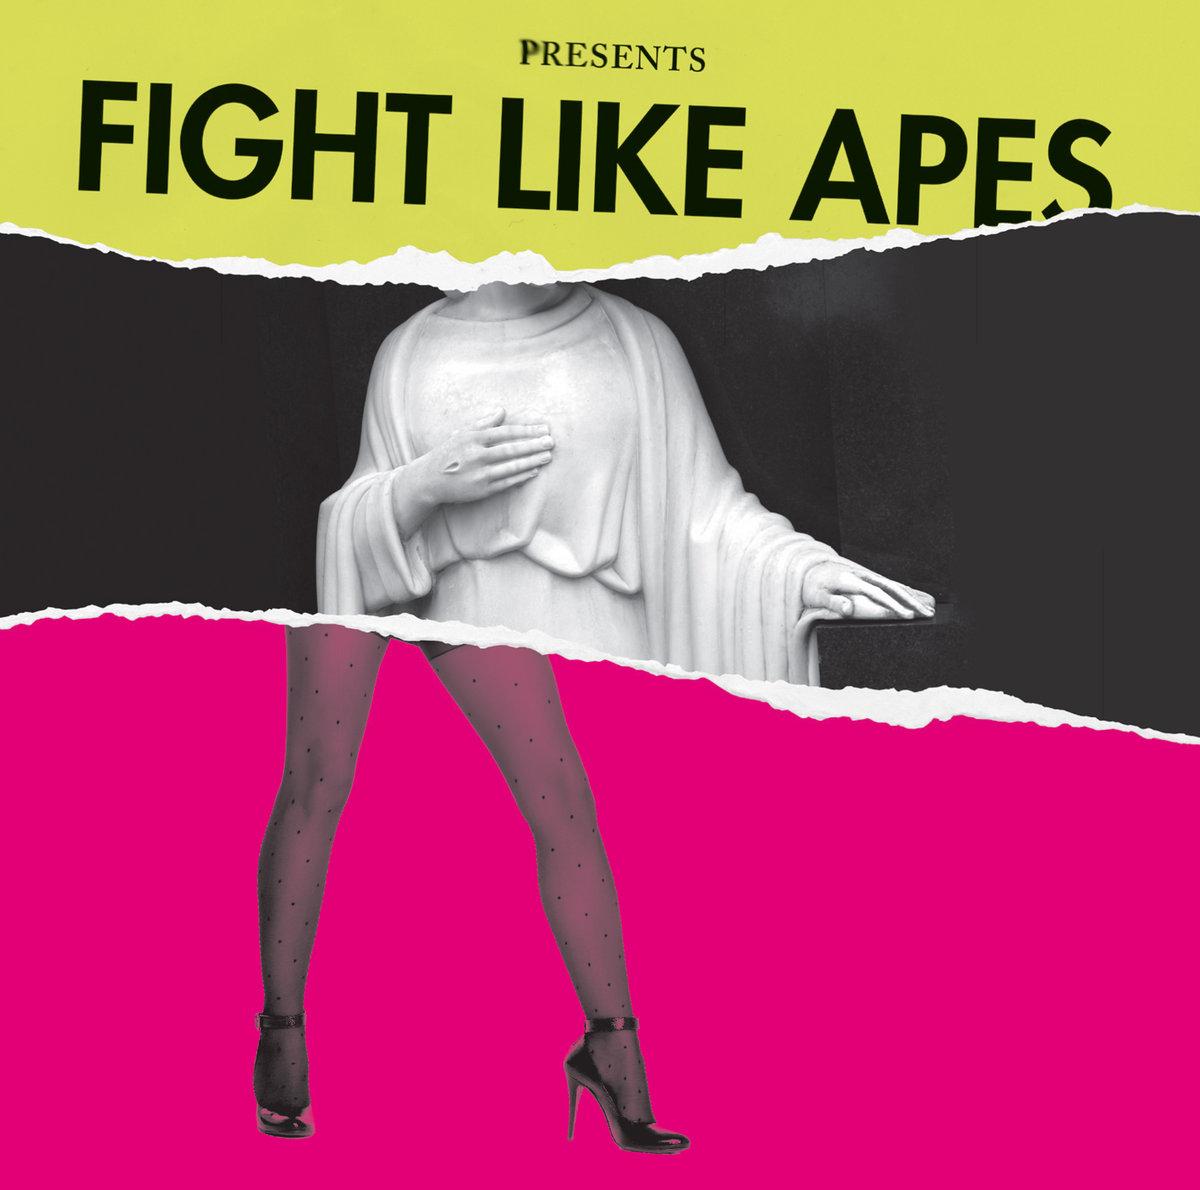 Kathmandu (Face it, You're Caviar, I'm Hotdogs) | Fight Like Apes